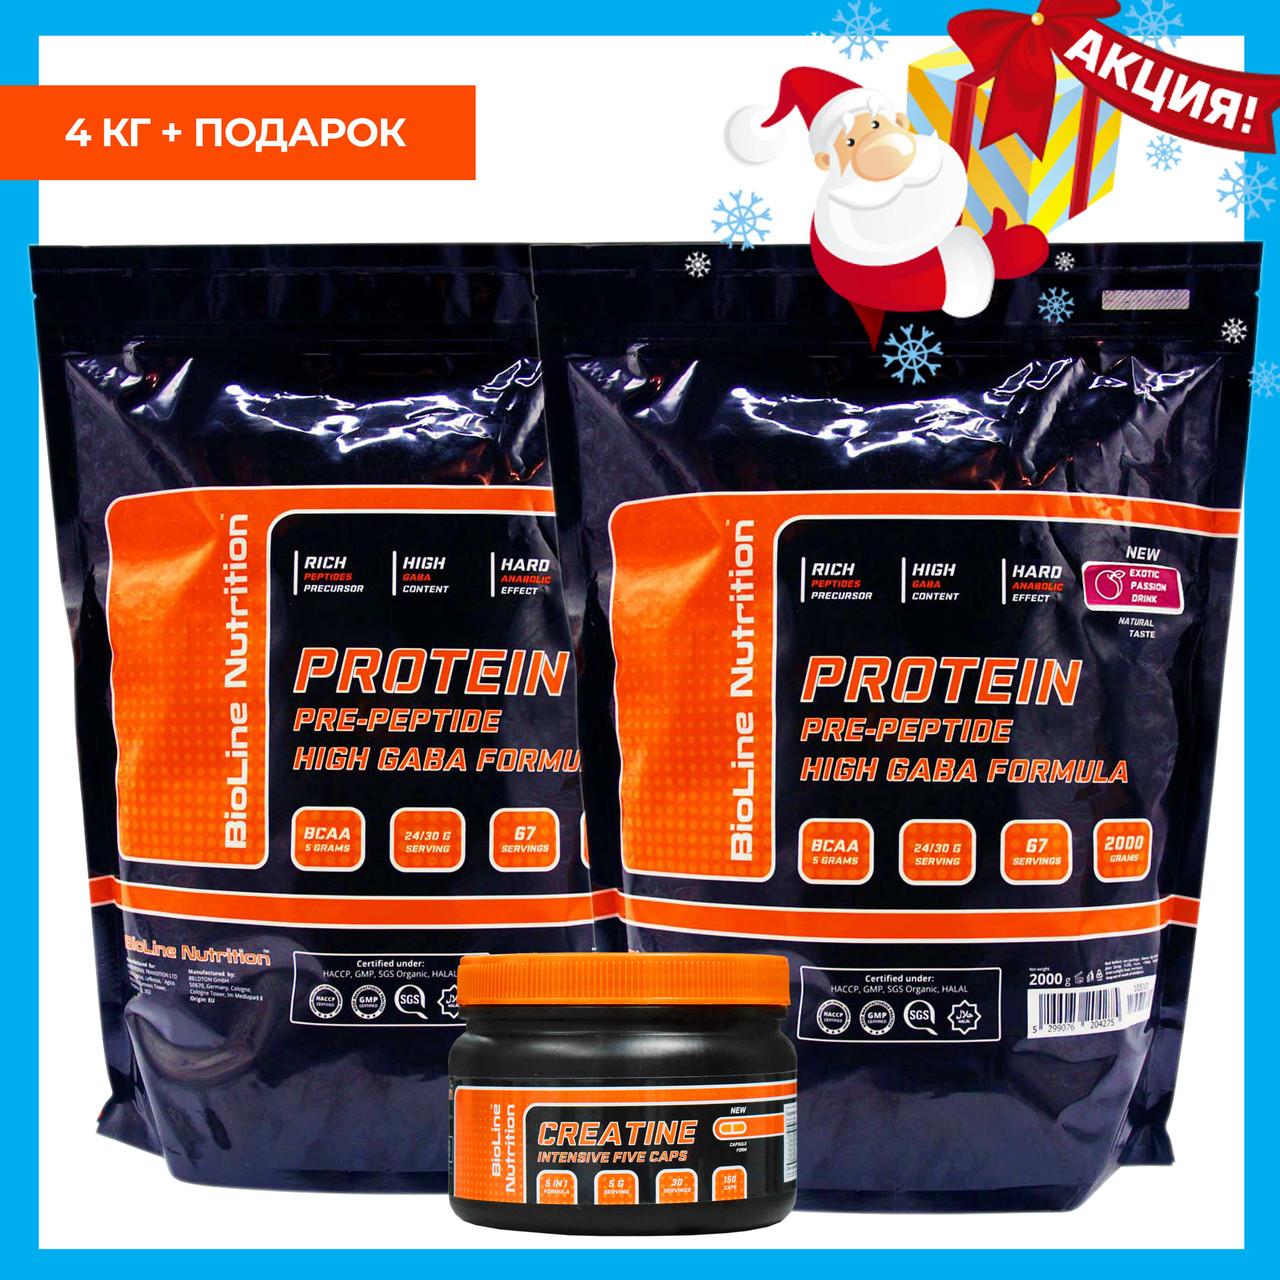 Протеин для роста мышц BL Nutrition Whey Protein + Креатин в подарок комплекс 4 кг.